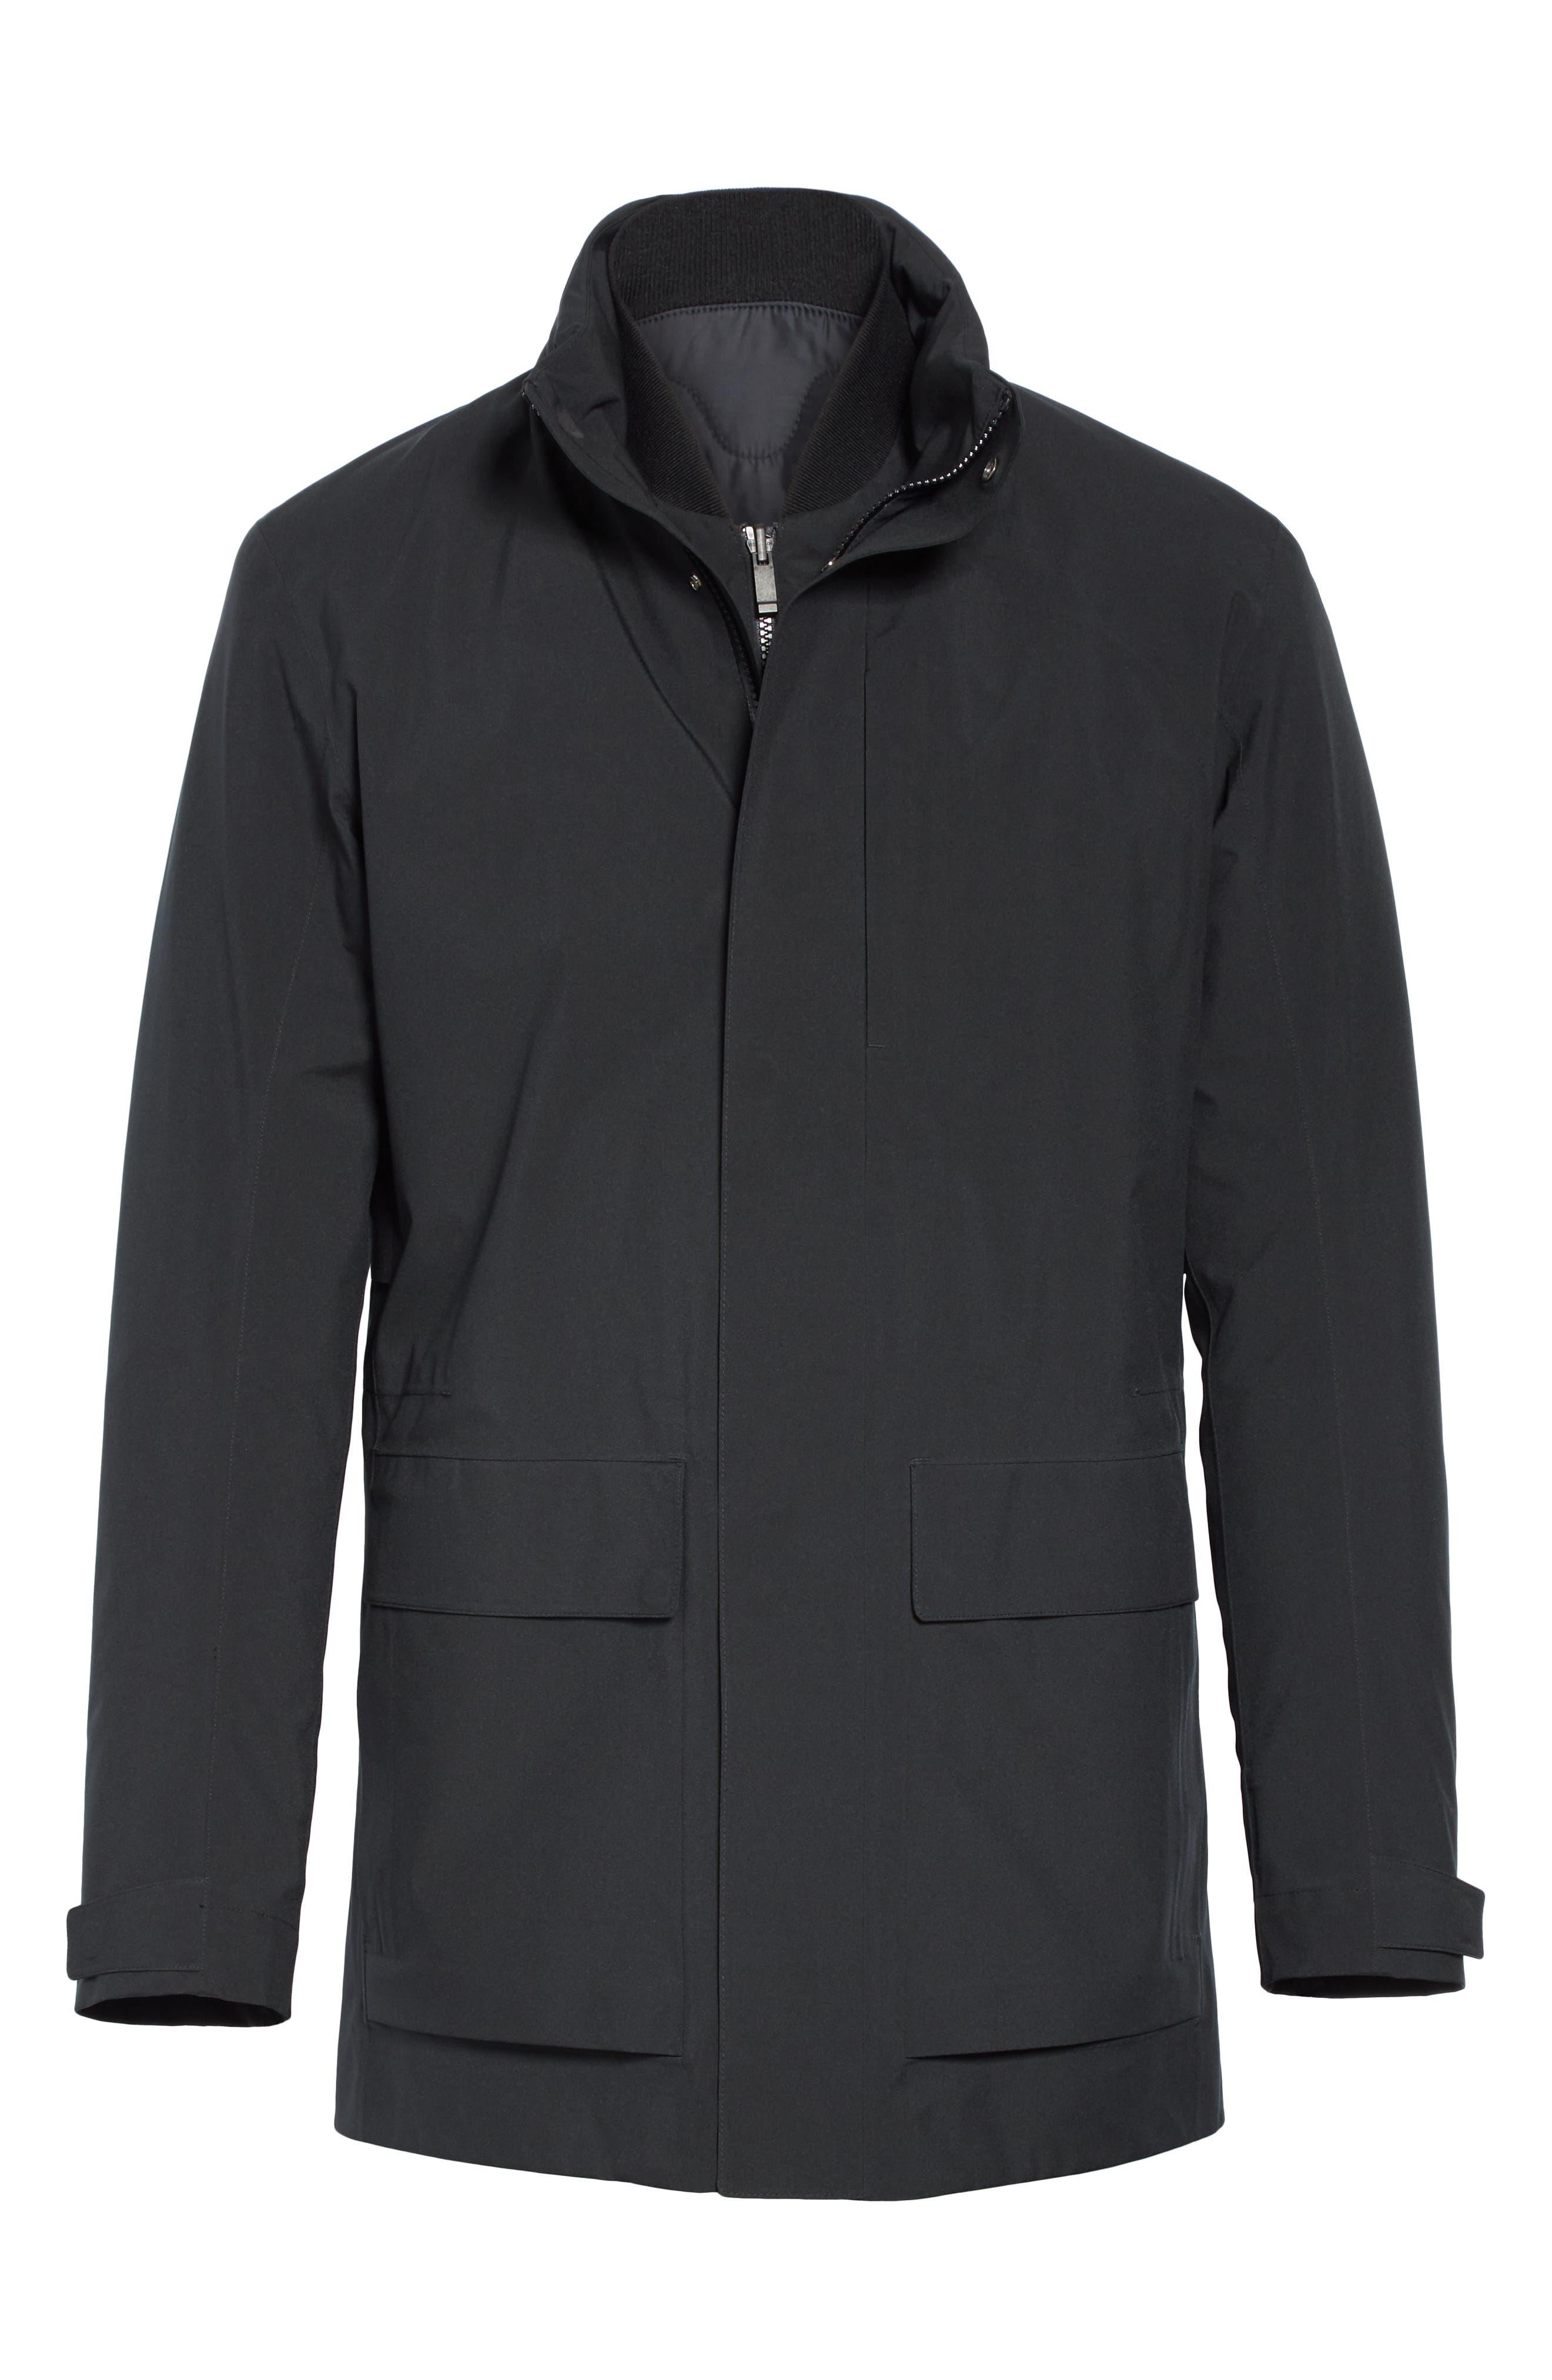 Z Zenga Trim Fit 3-in-1 Jacket,                             Alternate thumbnail 6, color,                             BLACK